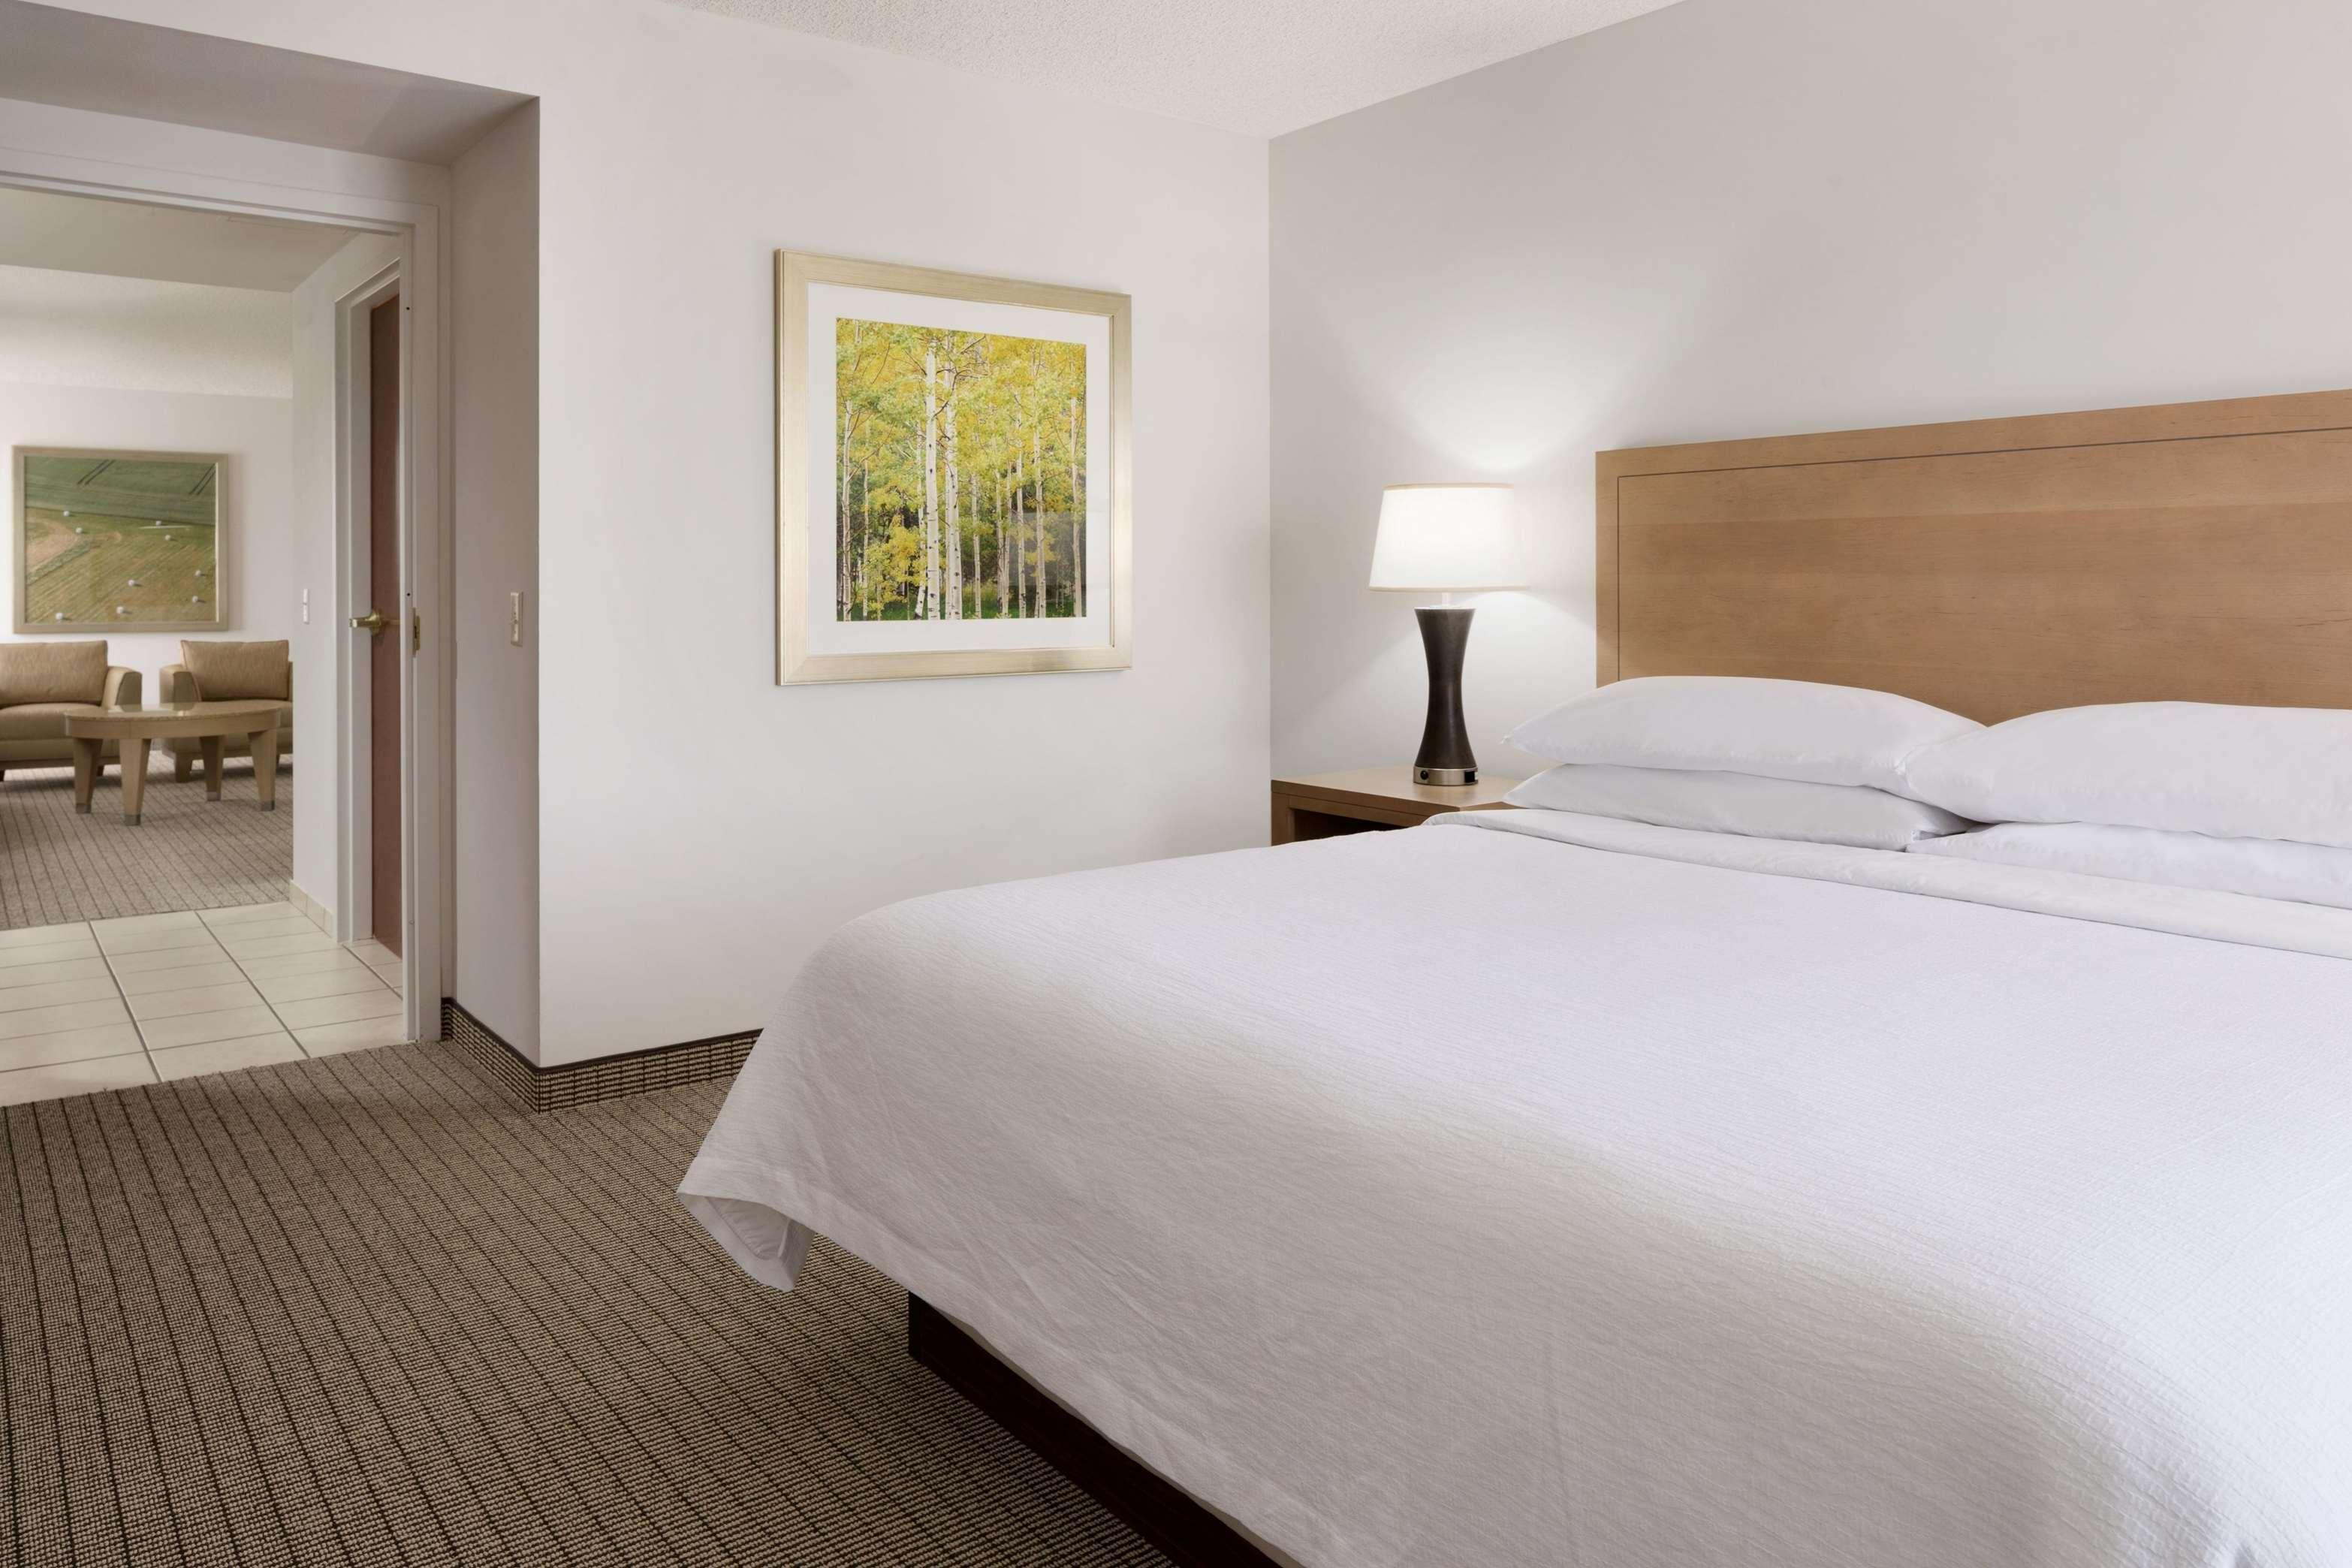 Embassy Suites by Hilton Denver International Airport image 26